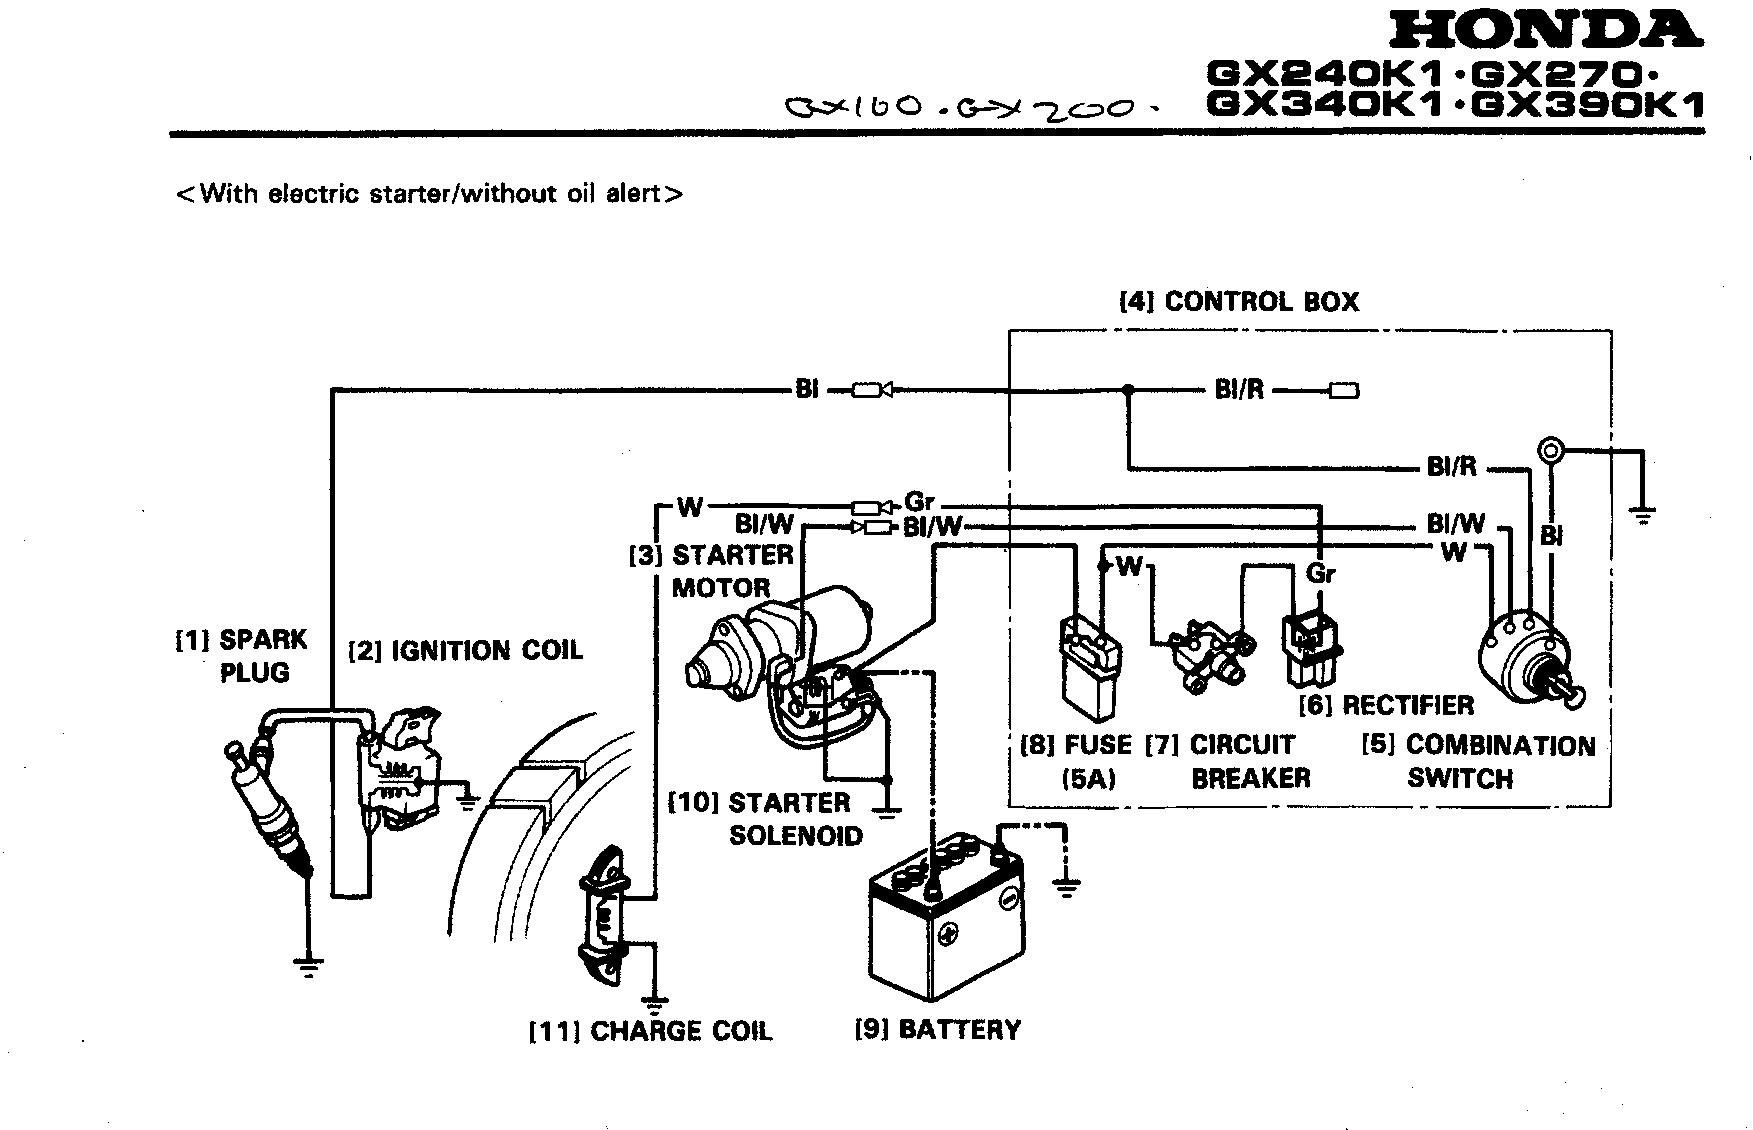 hight resolution of kohler engine charging system diagram john deere 111 wiring diagram john deere 111 pto wiring diagram